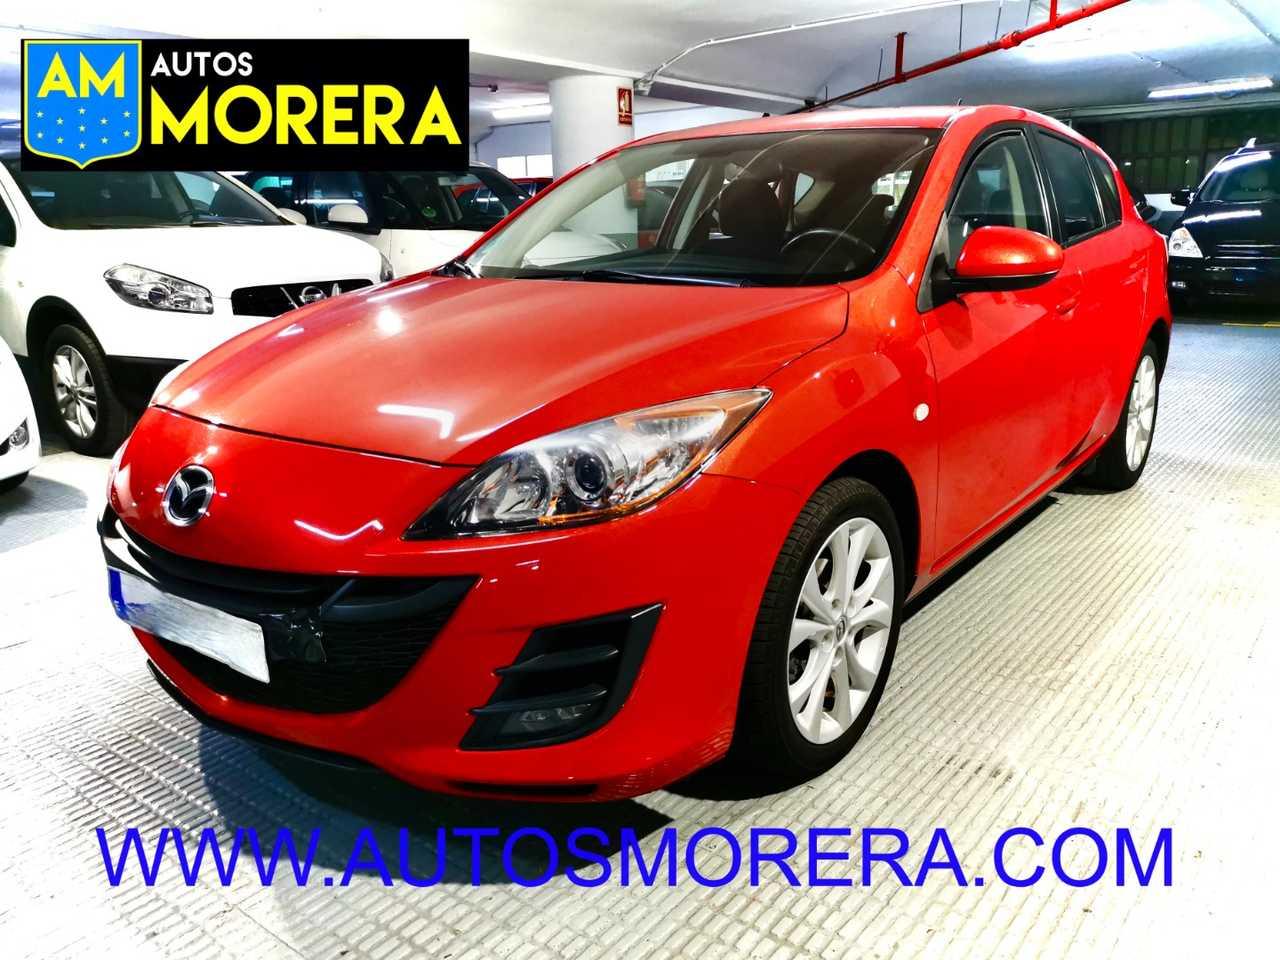 Mazda 3 1.6 Style 105cv. A toda prueba, perfecto !!!   - Foto 1